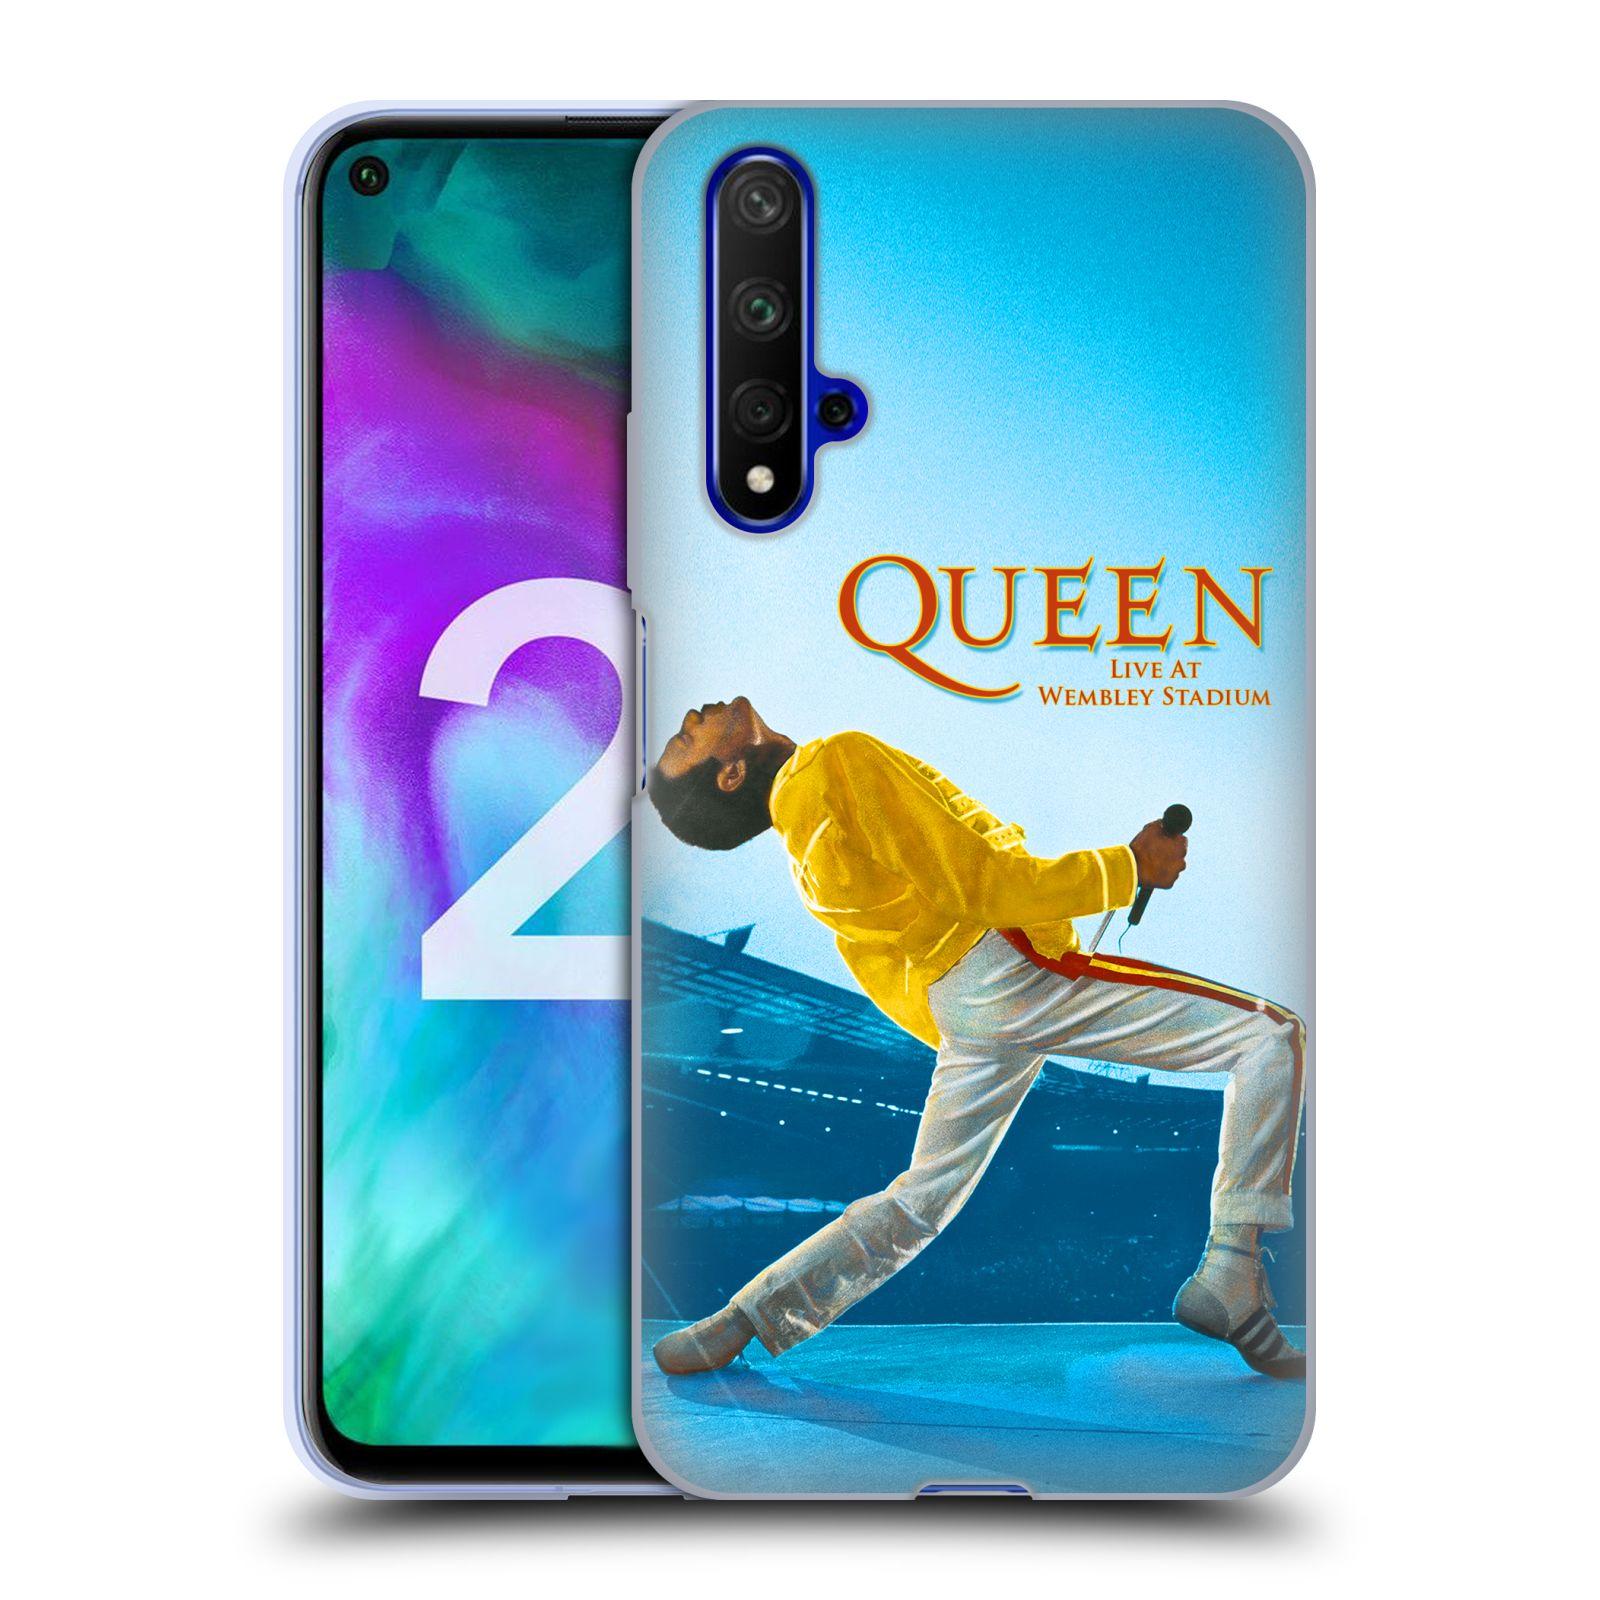 Silikonové pouzdro na mobil Honor 20 - Head Case - Queen - Freddie Mercury